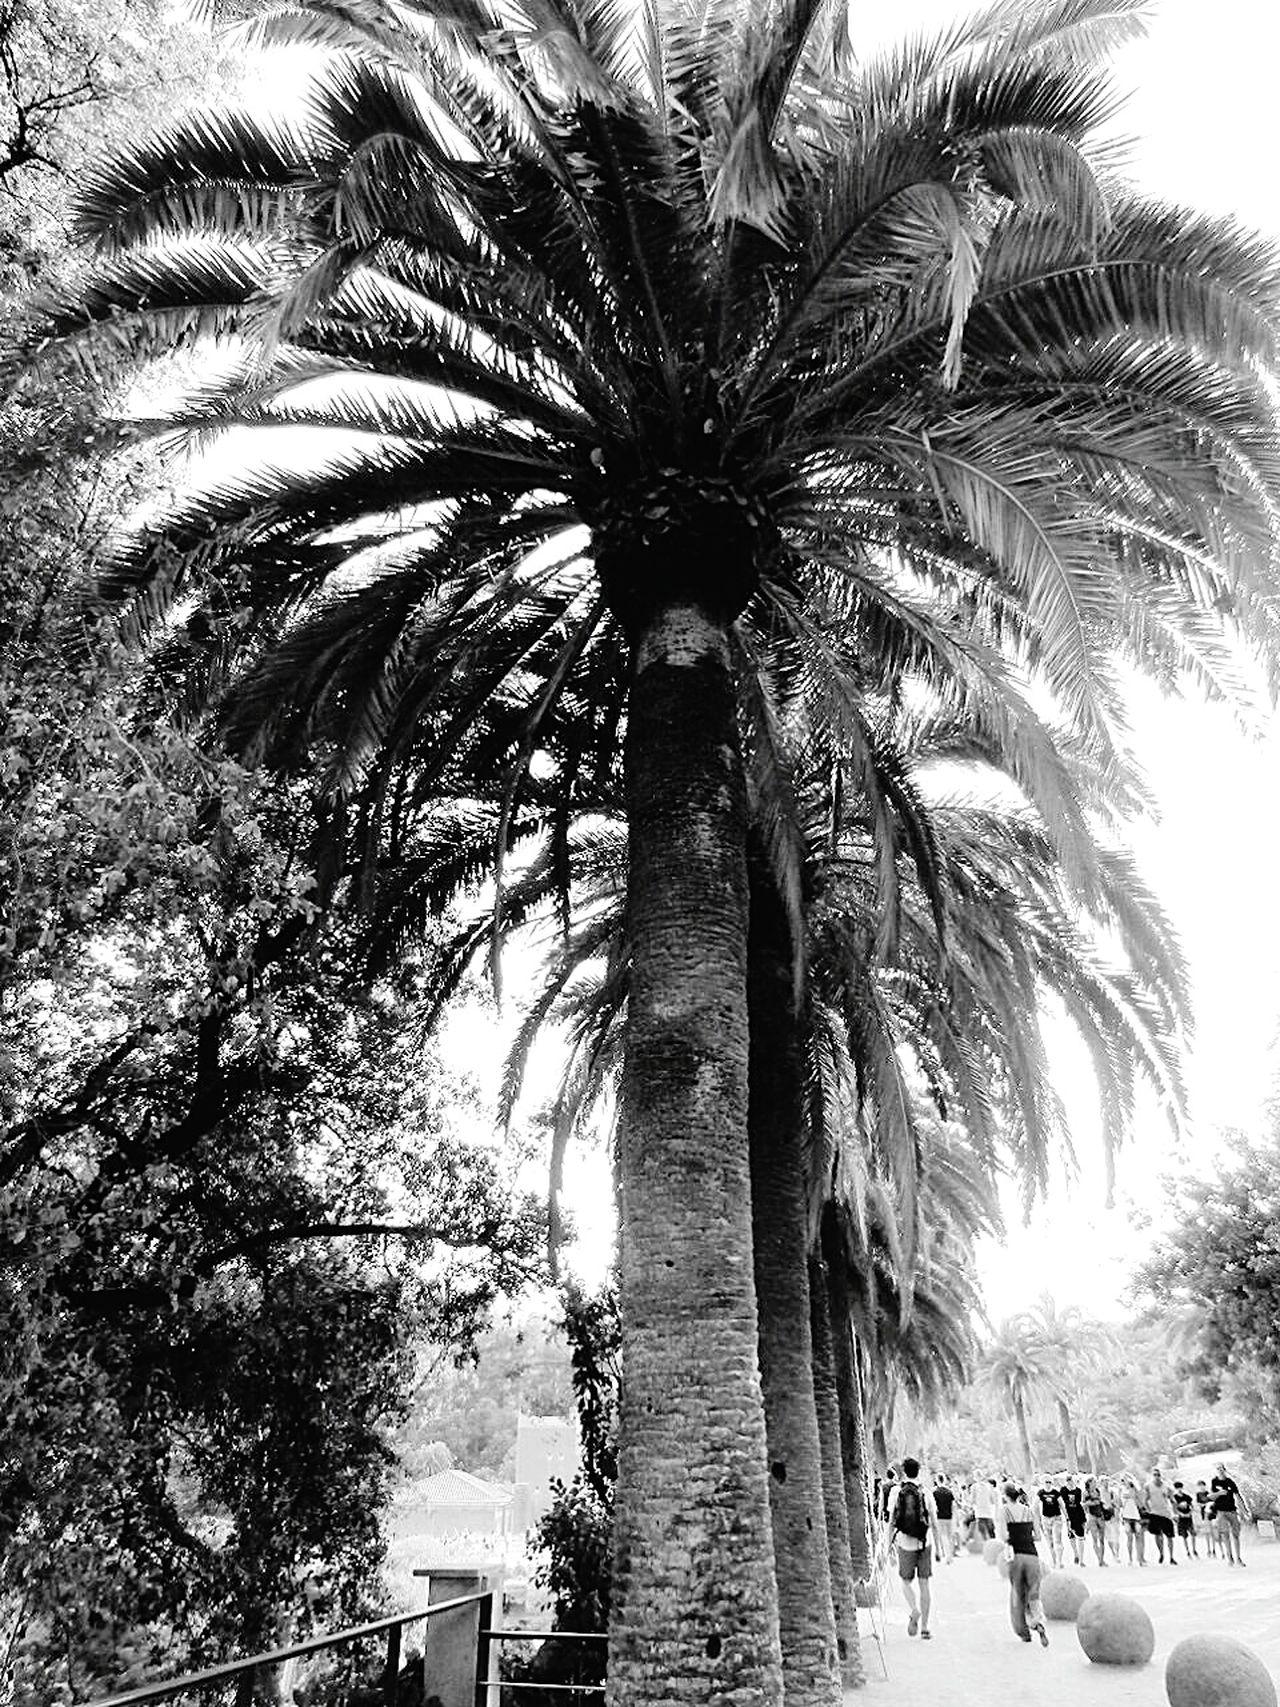 Blackandwhite Blackandwhitephotography Palmtrees Parkphotography Todayphotography Naturephotography Parkguell SPAIN Barcelona Fine Art Photography Taking Photos Eyeemcollection Eyeemphotography Beauty In Nature Calming Huge Amazingview Eyeemphoto